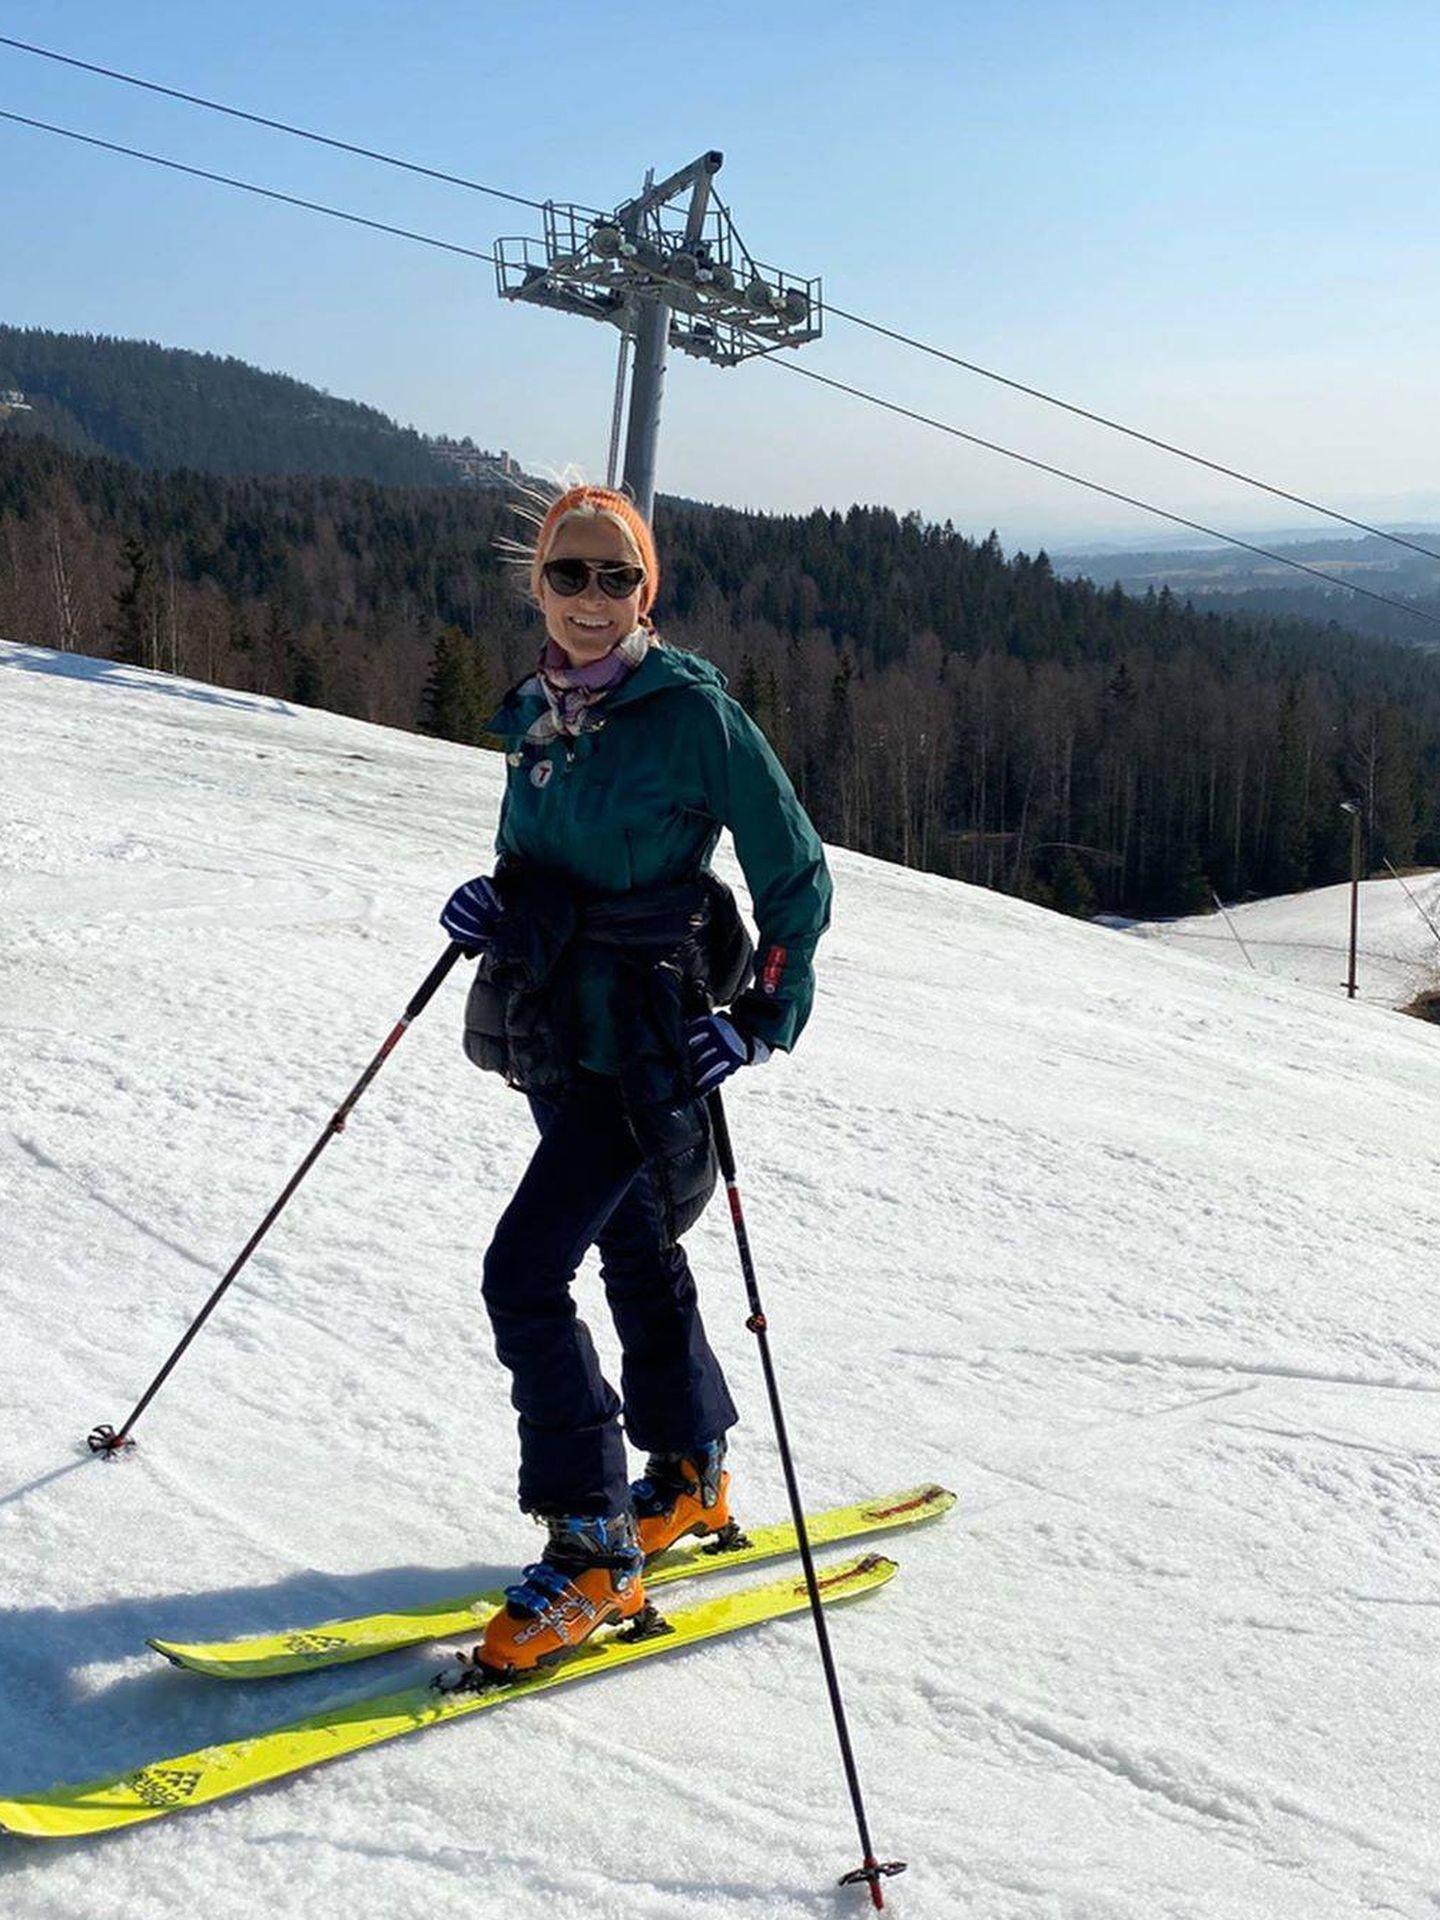 Mette-Marit, practicando esquí. (Instagram @crownprincessmm)